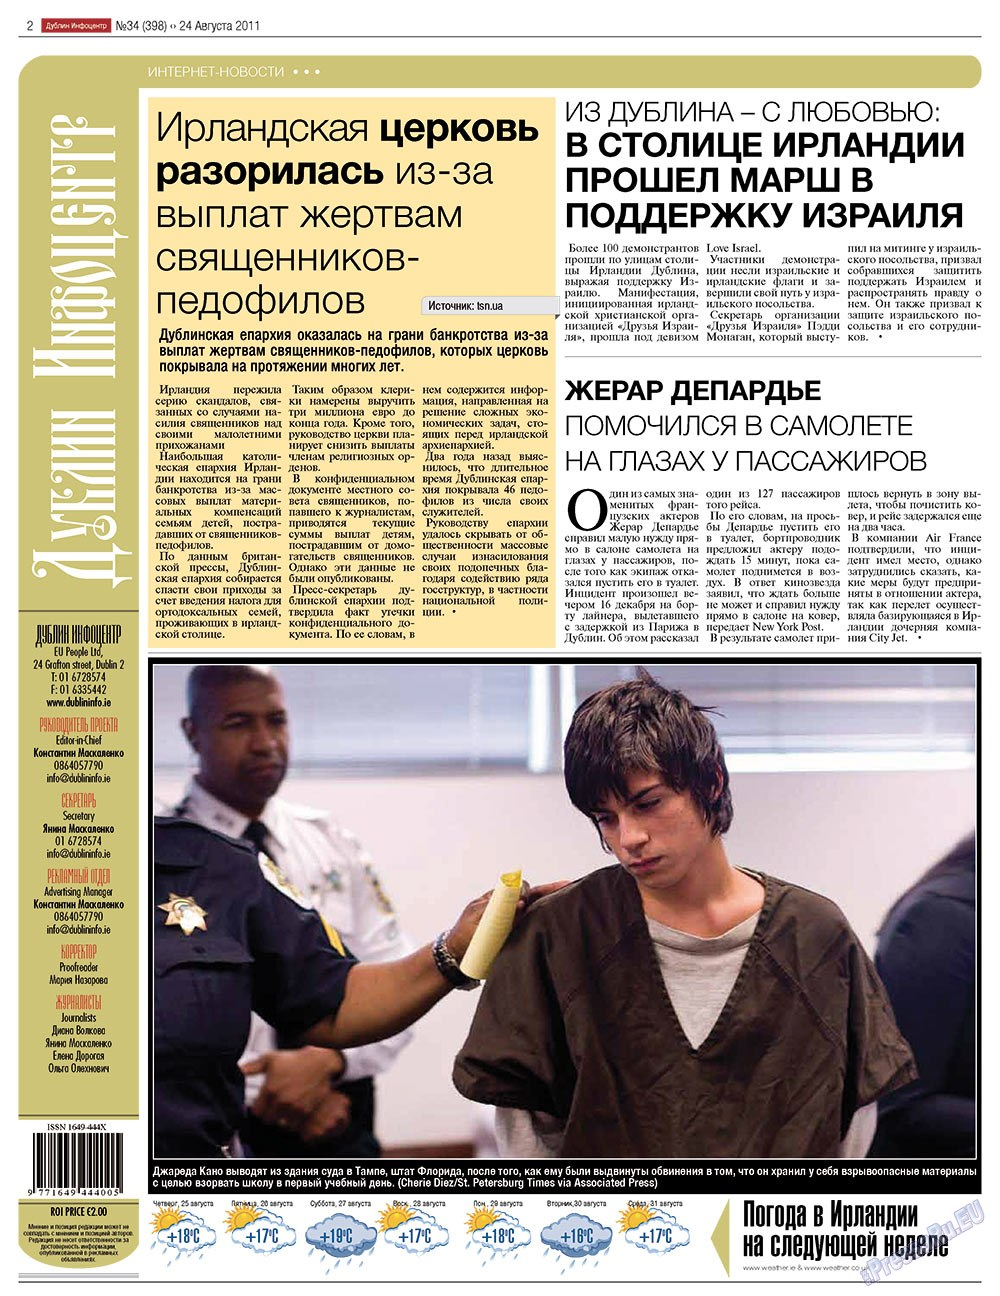 Дублин инфоцентр (газета). 2011 год, номер 34, стр. 2